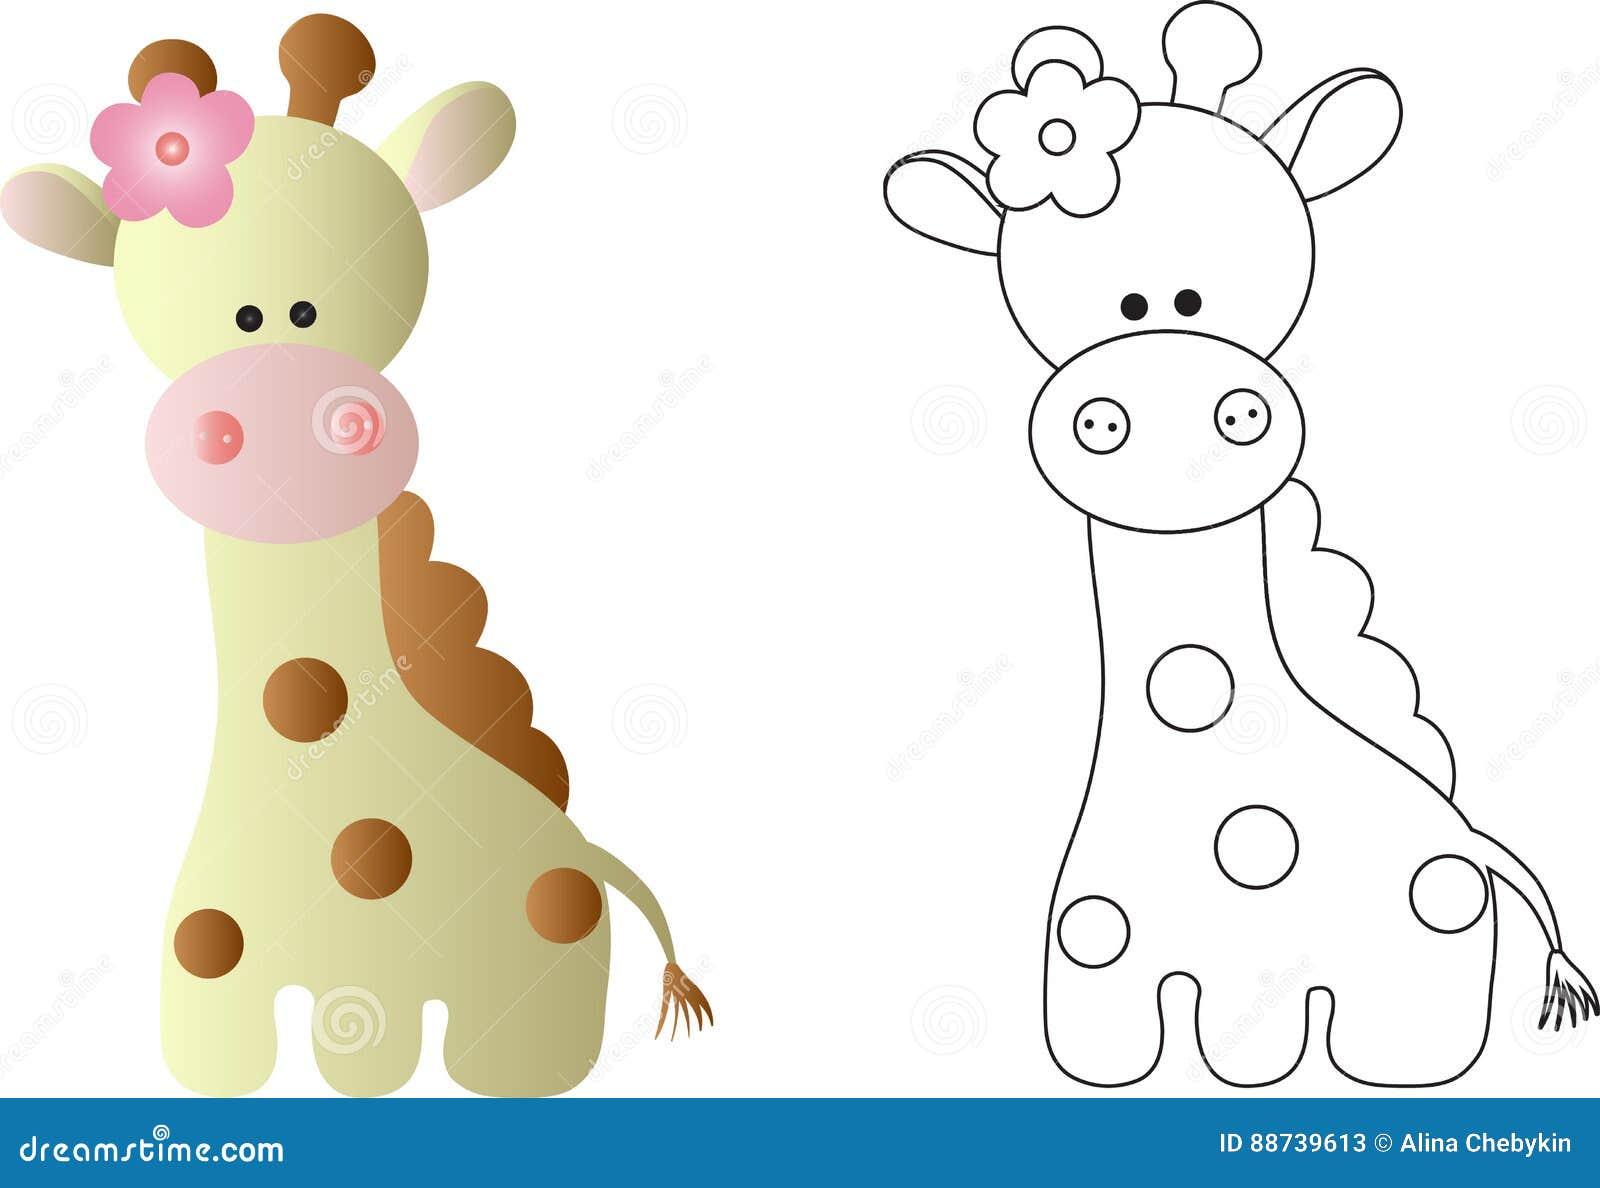 Cartoon Cute Baby Giraffe In Color And Line Art Stock Vector